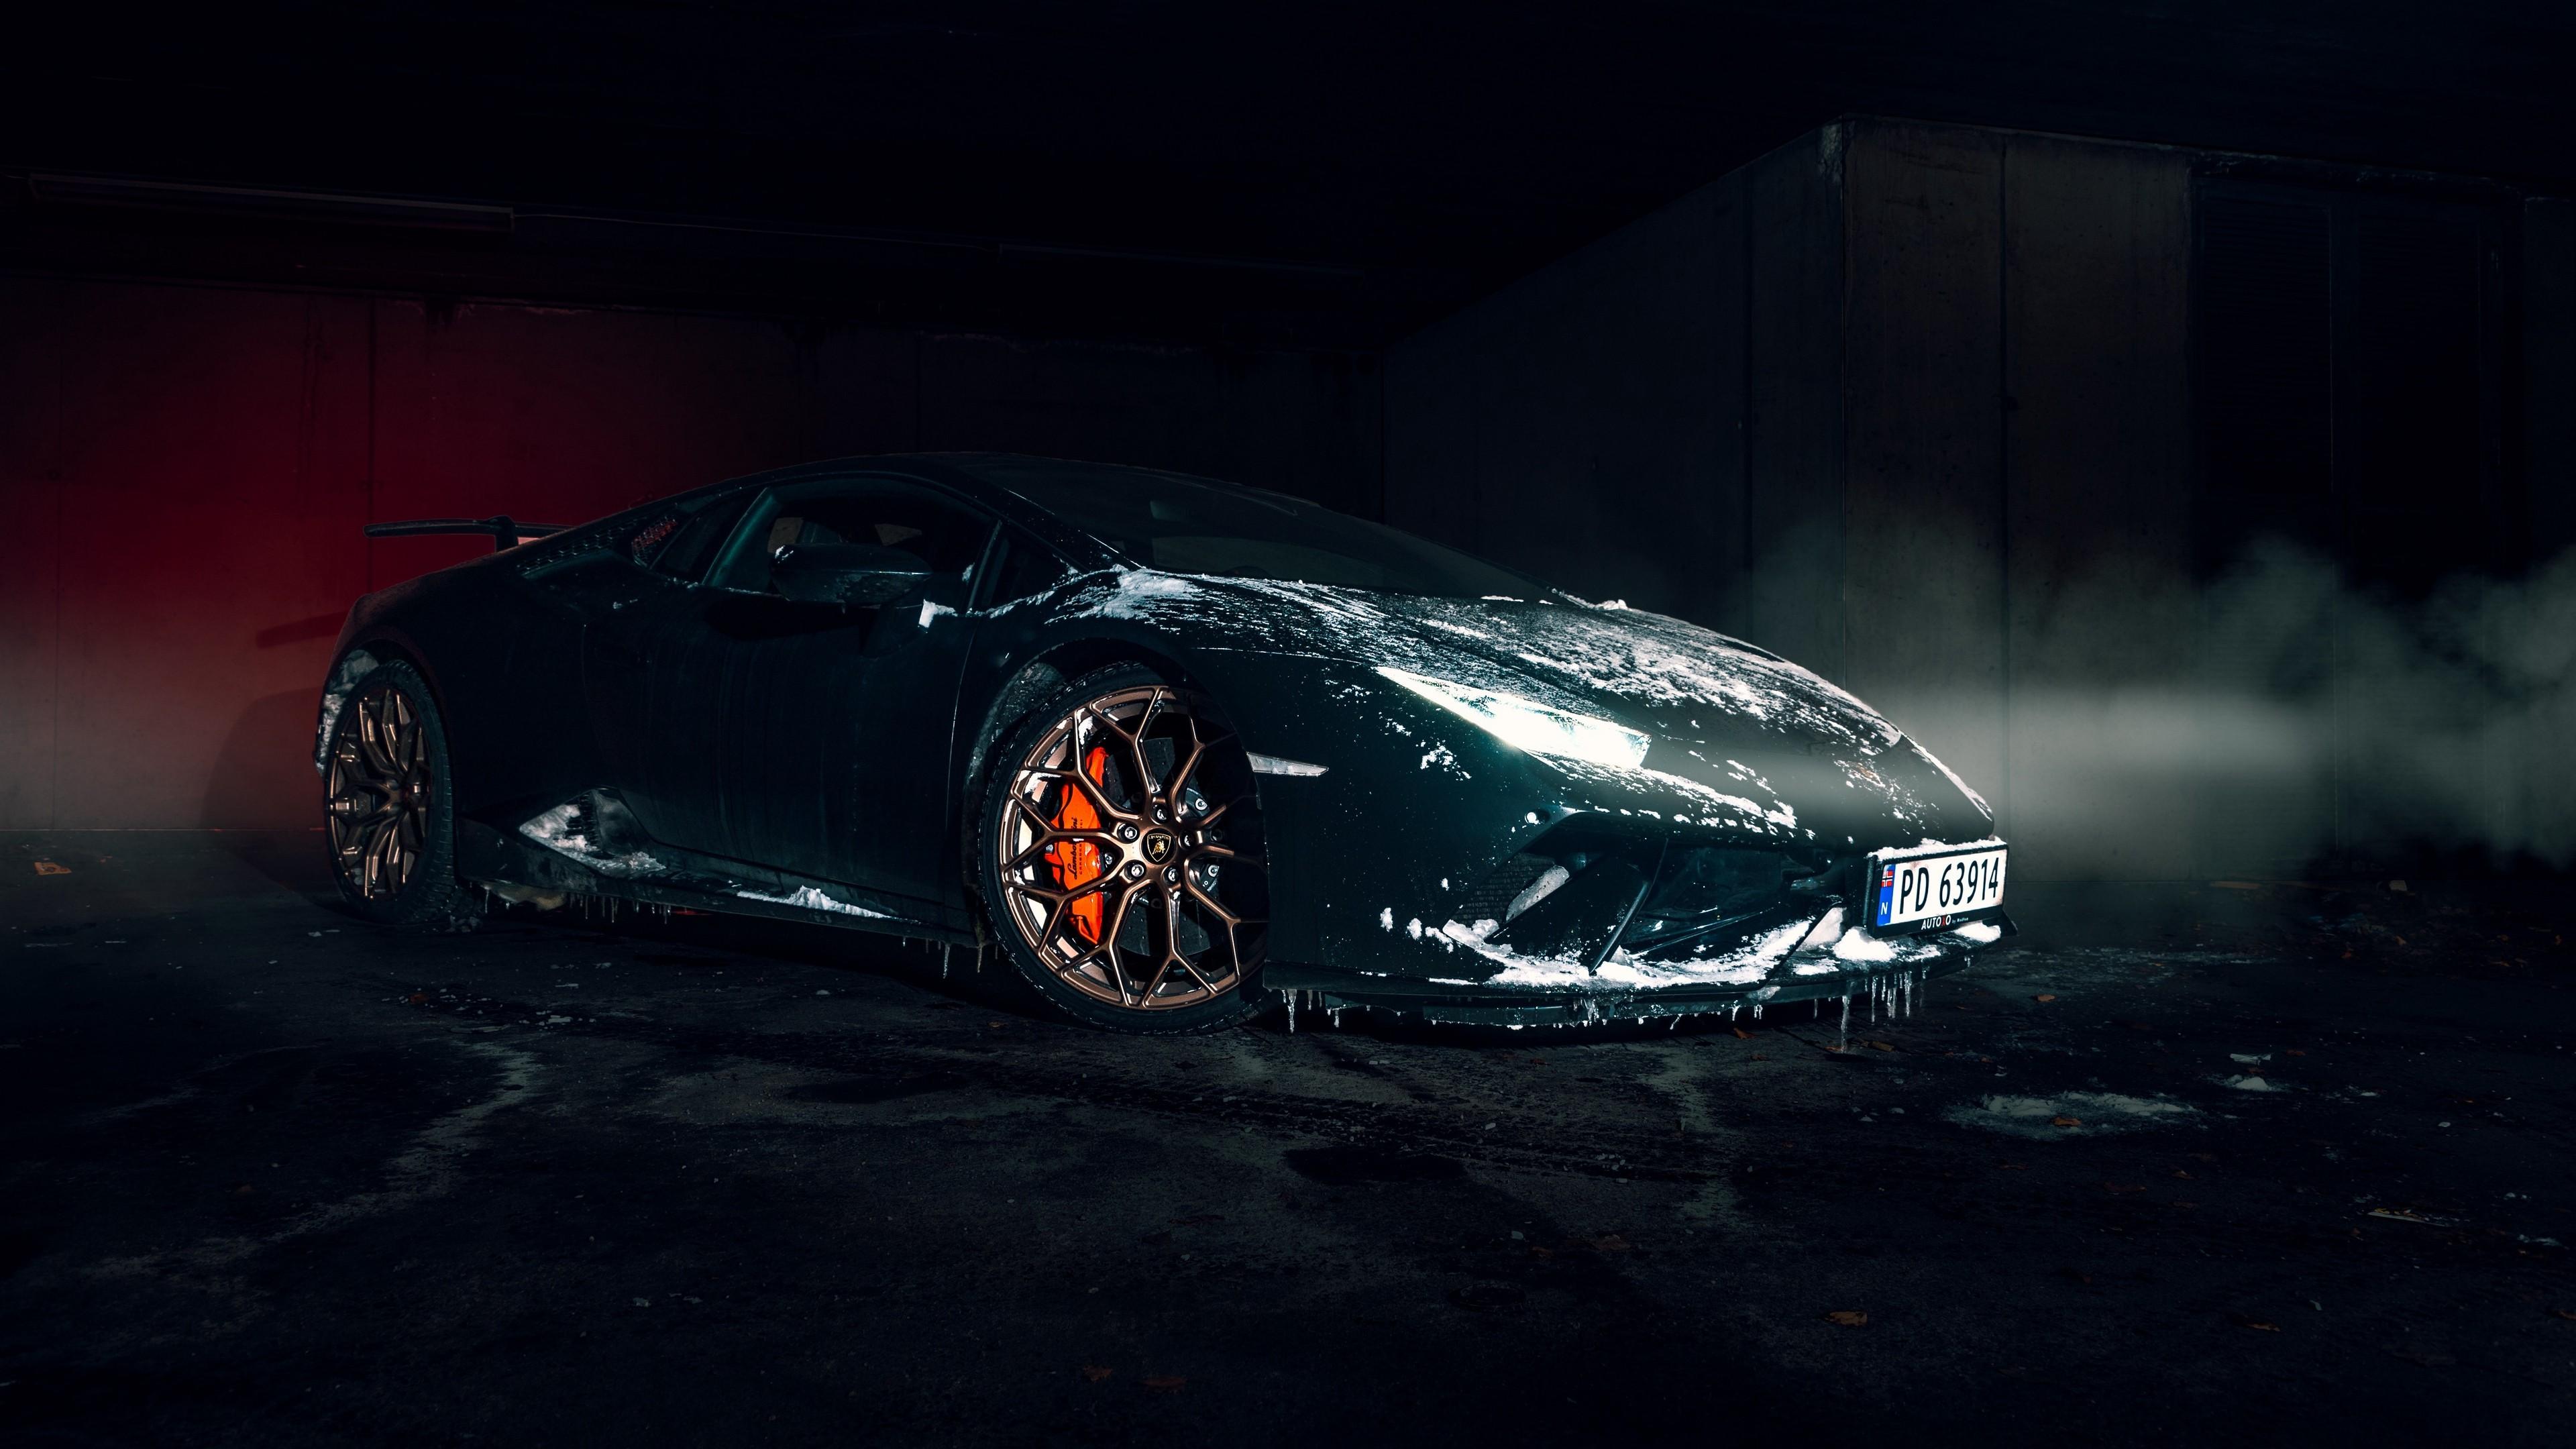 4k Lamborghini Aventador Wallpaper 3840x2160